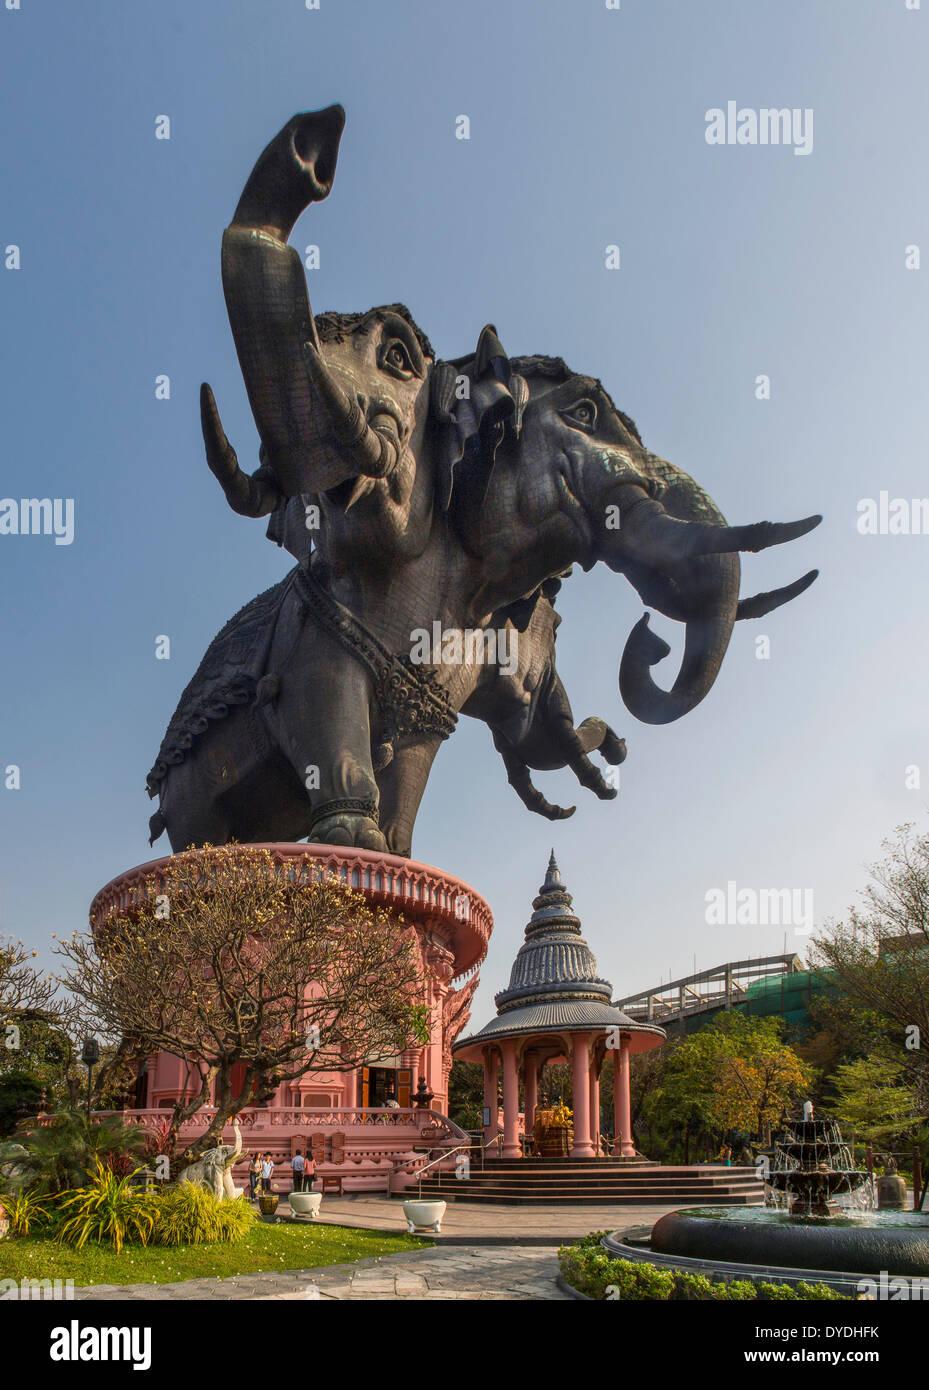 Thailand, Asia, Bangkok, Erawan, architecture, culture, elephant, exterior, impact, museum, touristic, travel, visual, weird - Stock Image